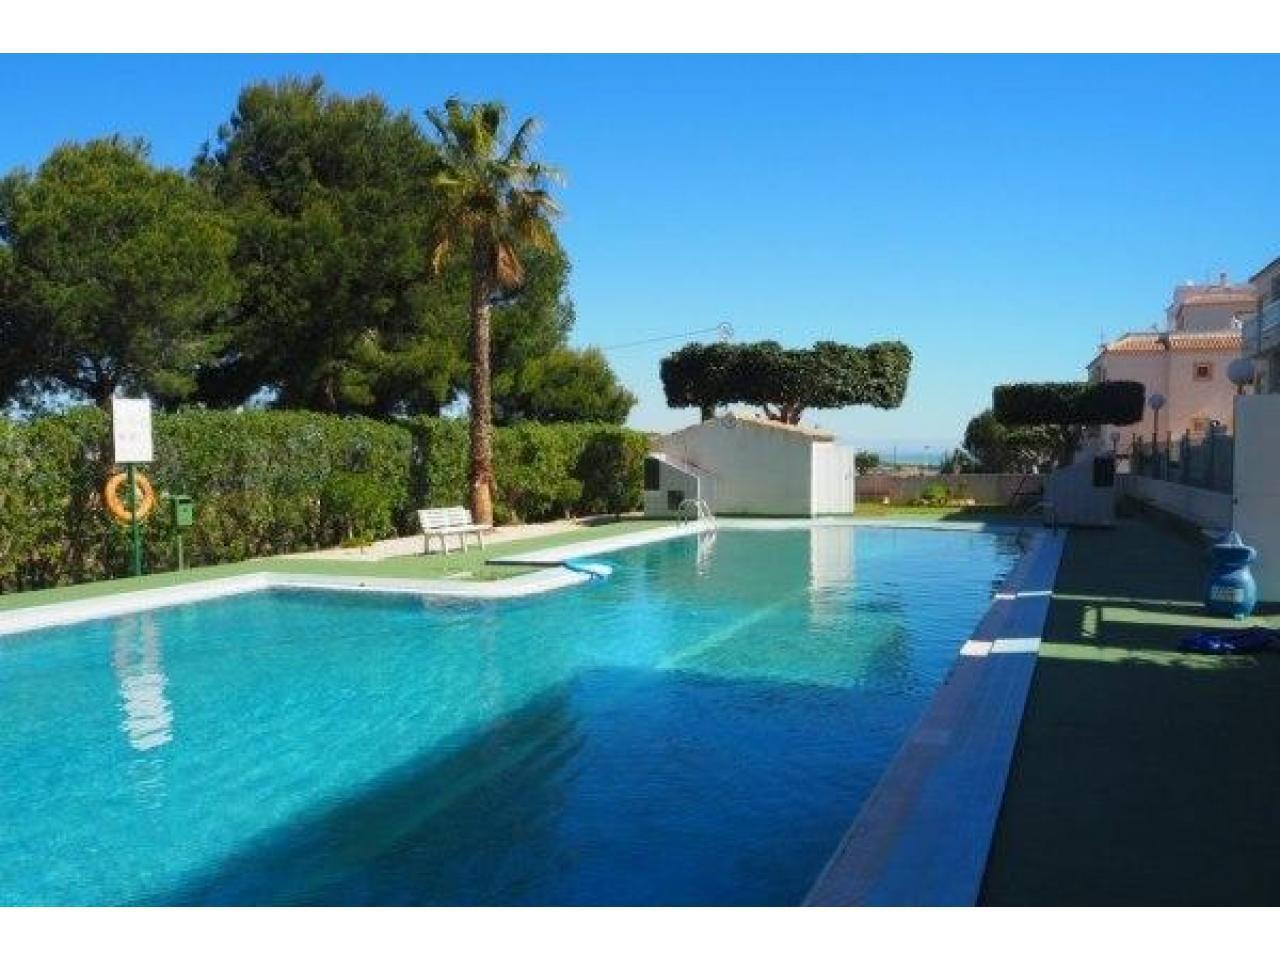 Недвижимость в Испании, Квартира c видами на море в Торревьеха,Коста Бланка,Испания - 3